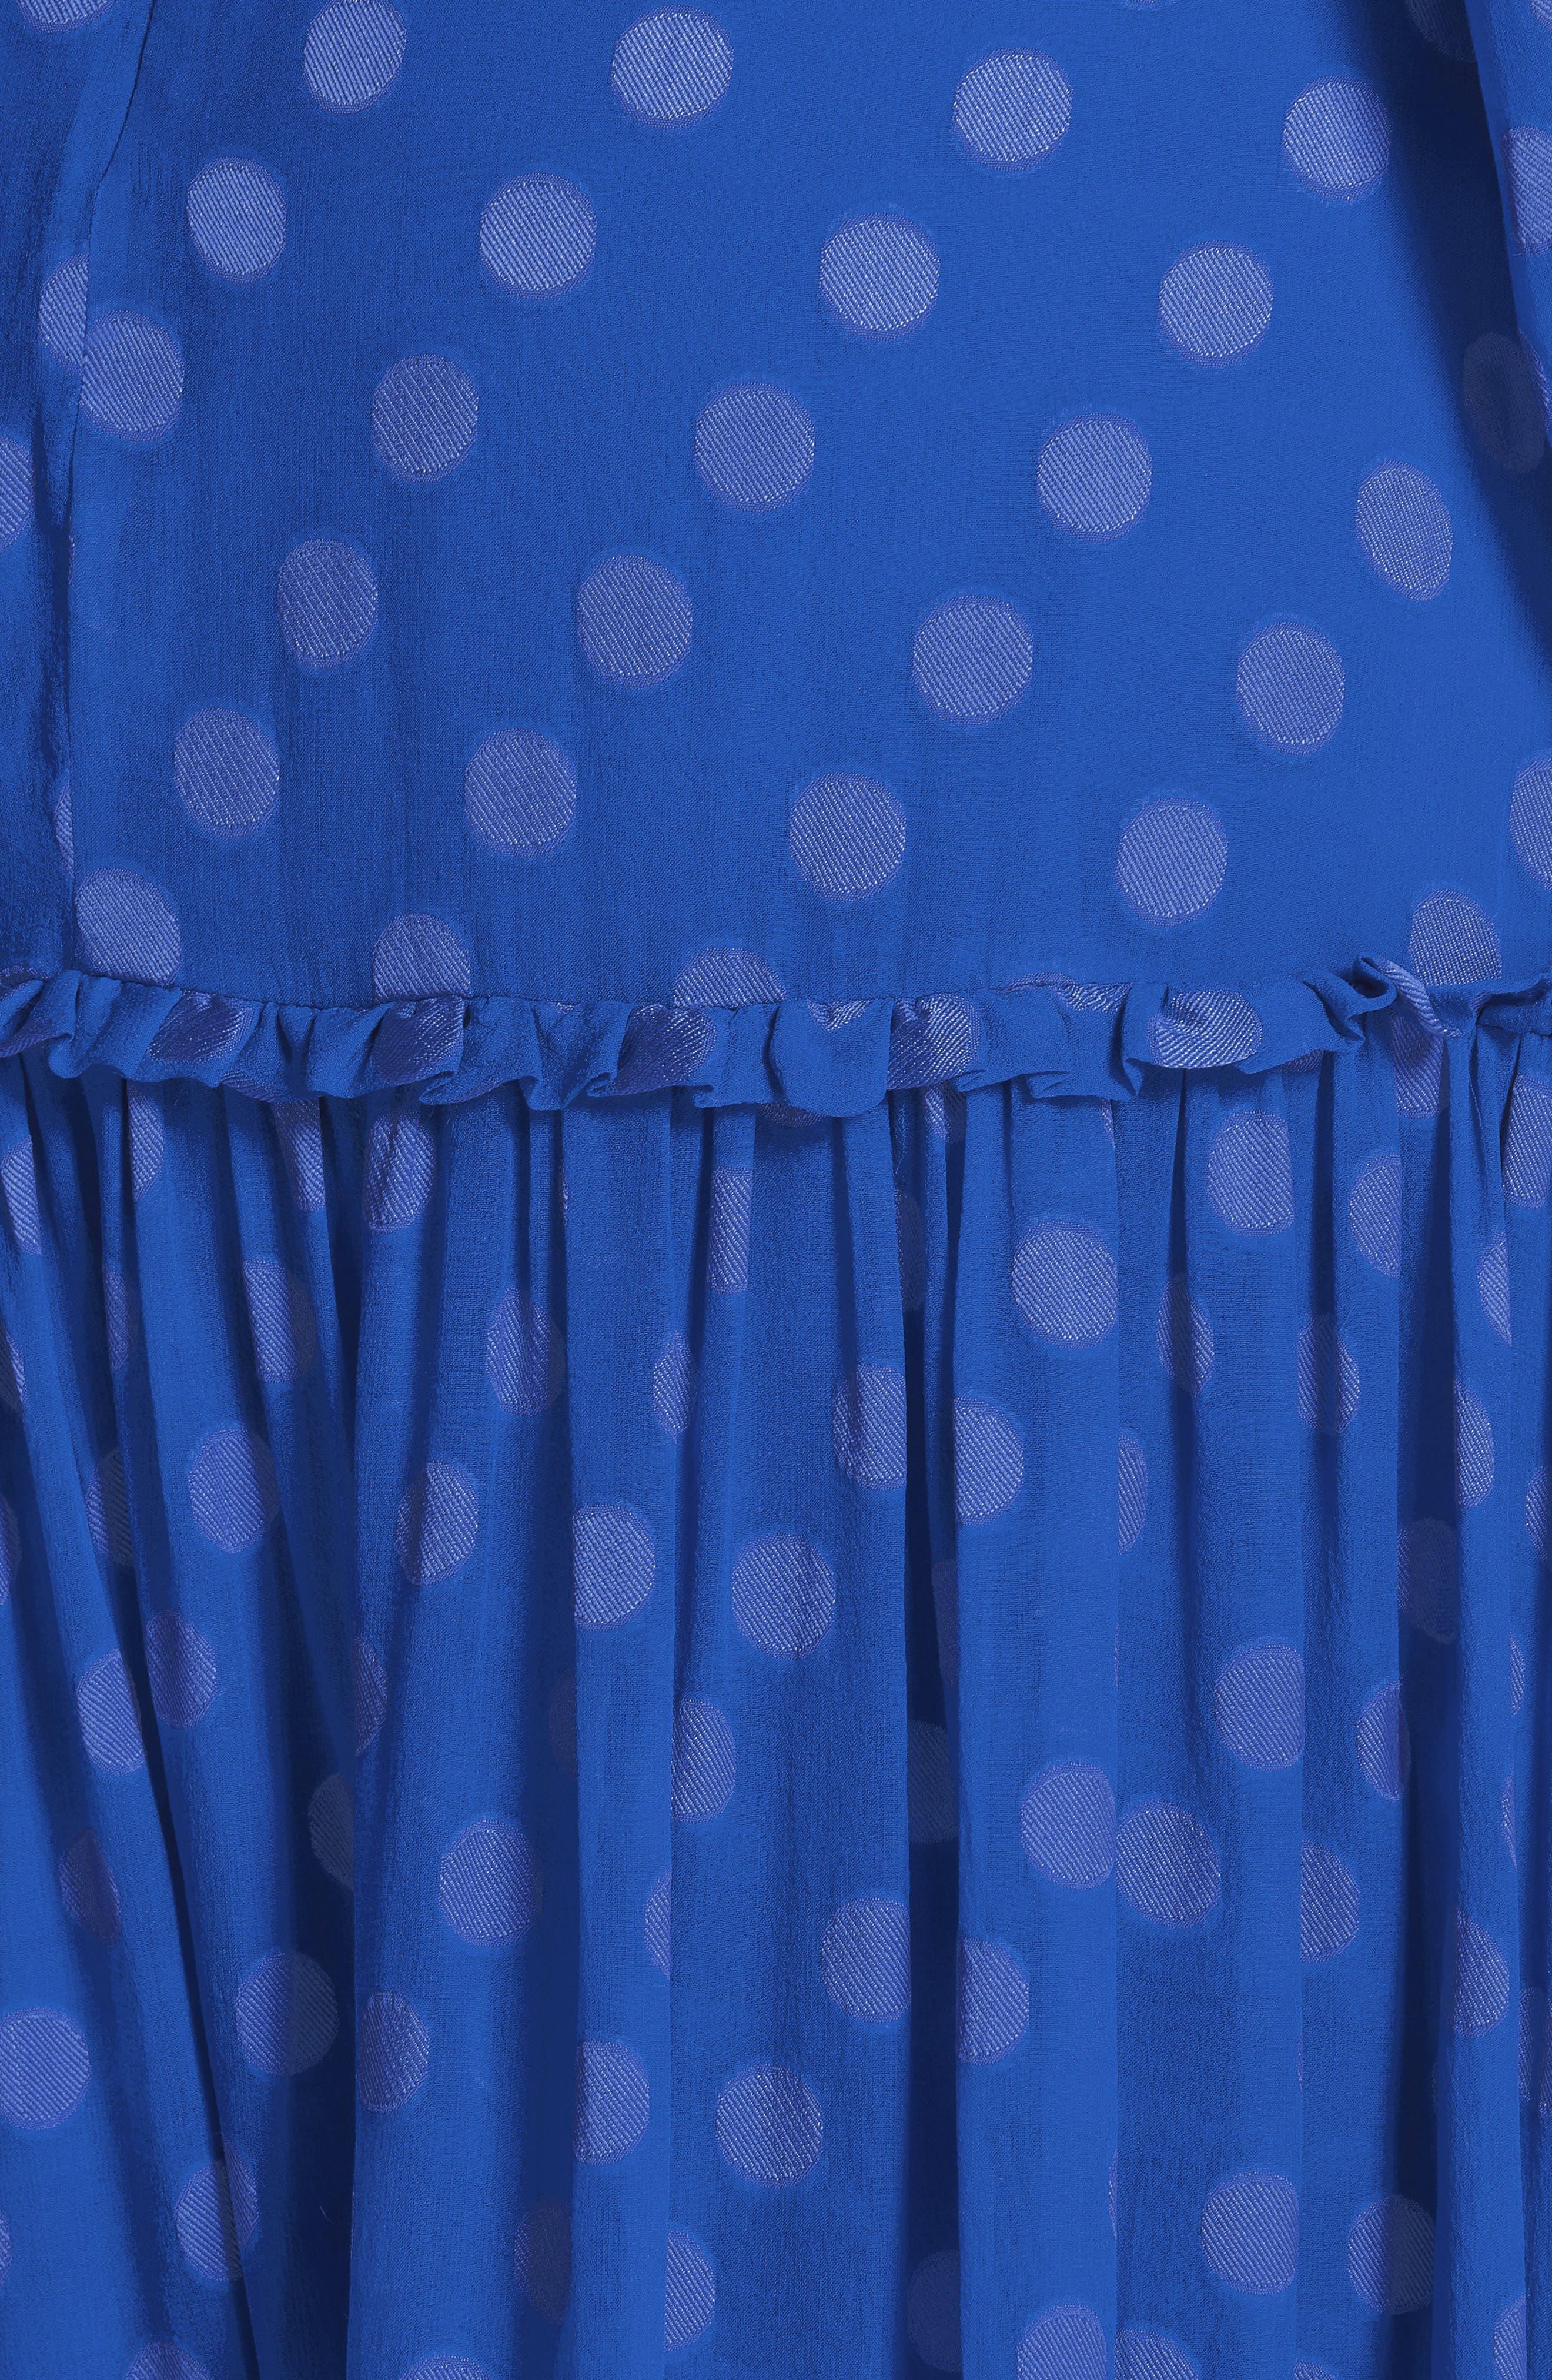 SALONI, Polka Dot Ruffle Dress, Alternate thumbnail 6, color, COBALT BLUE